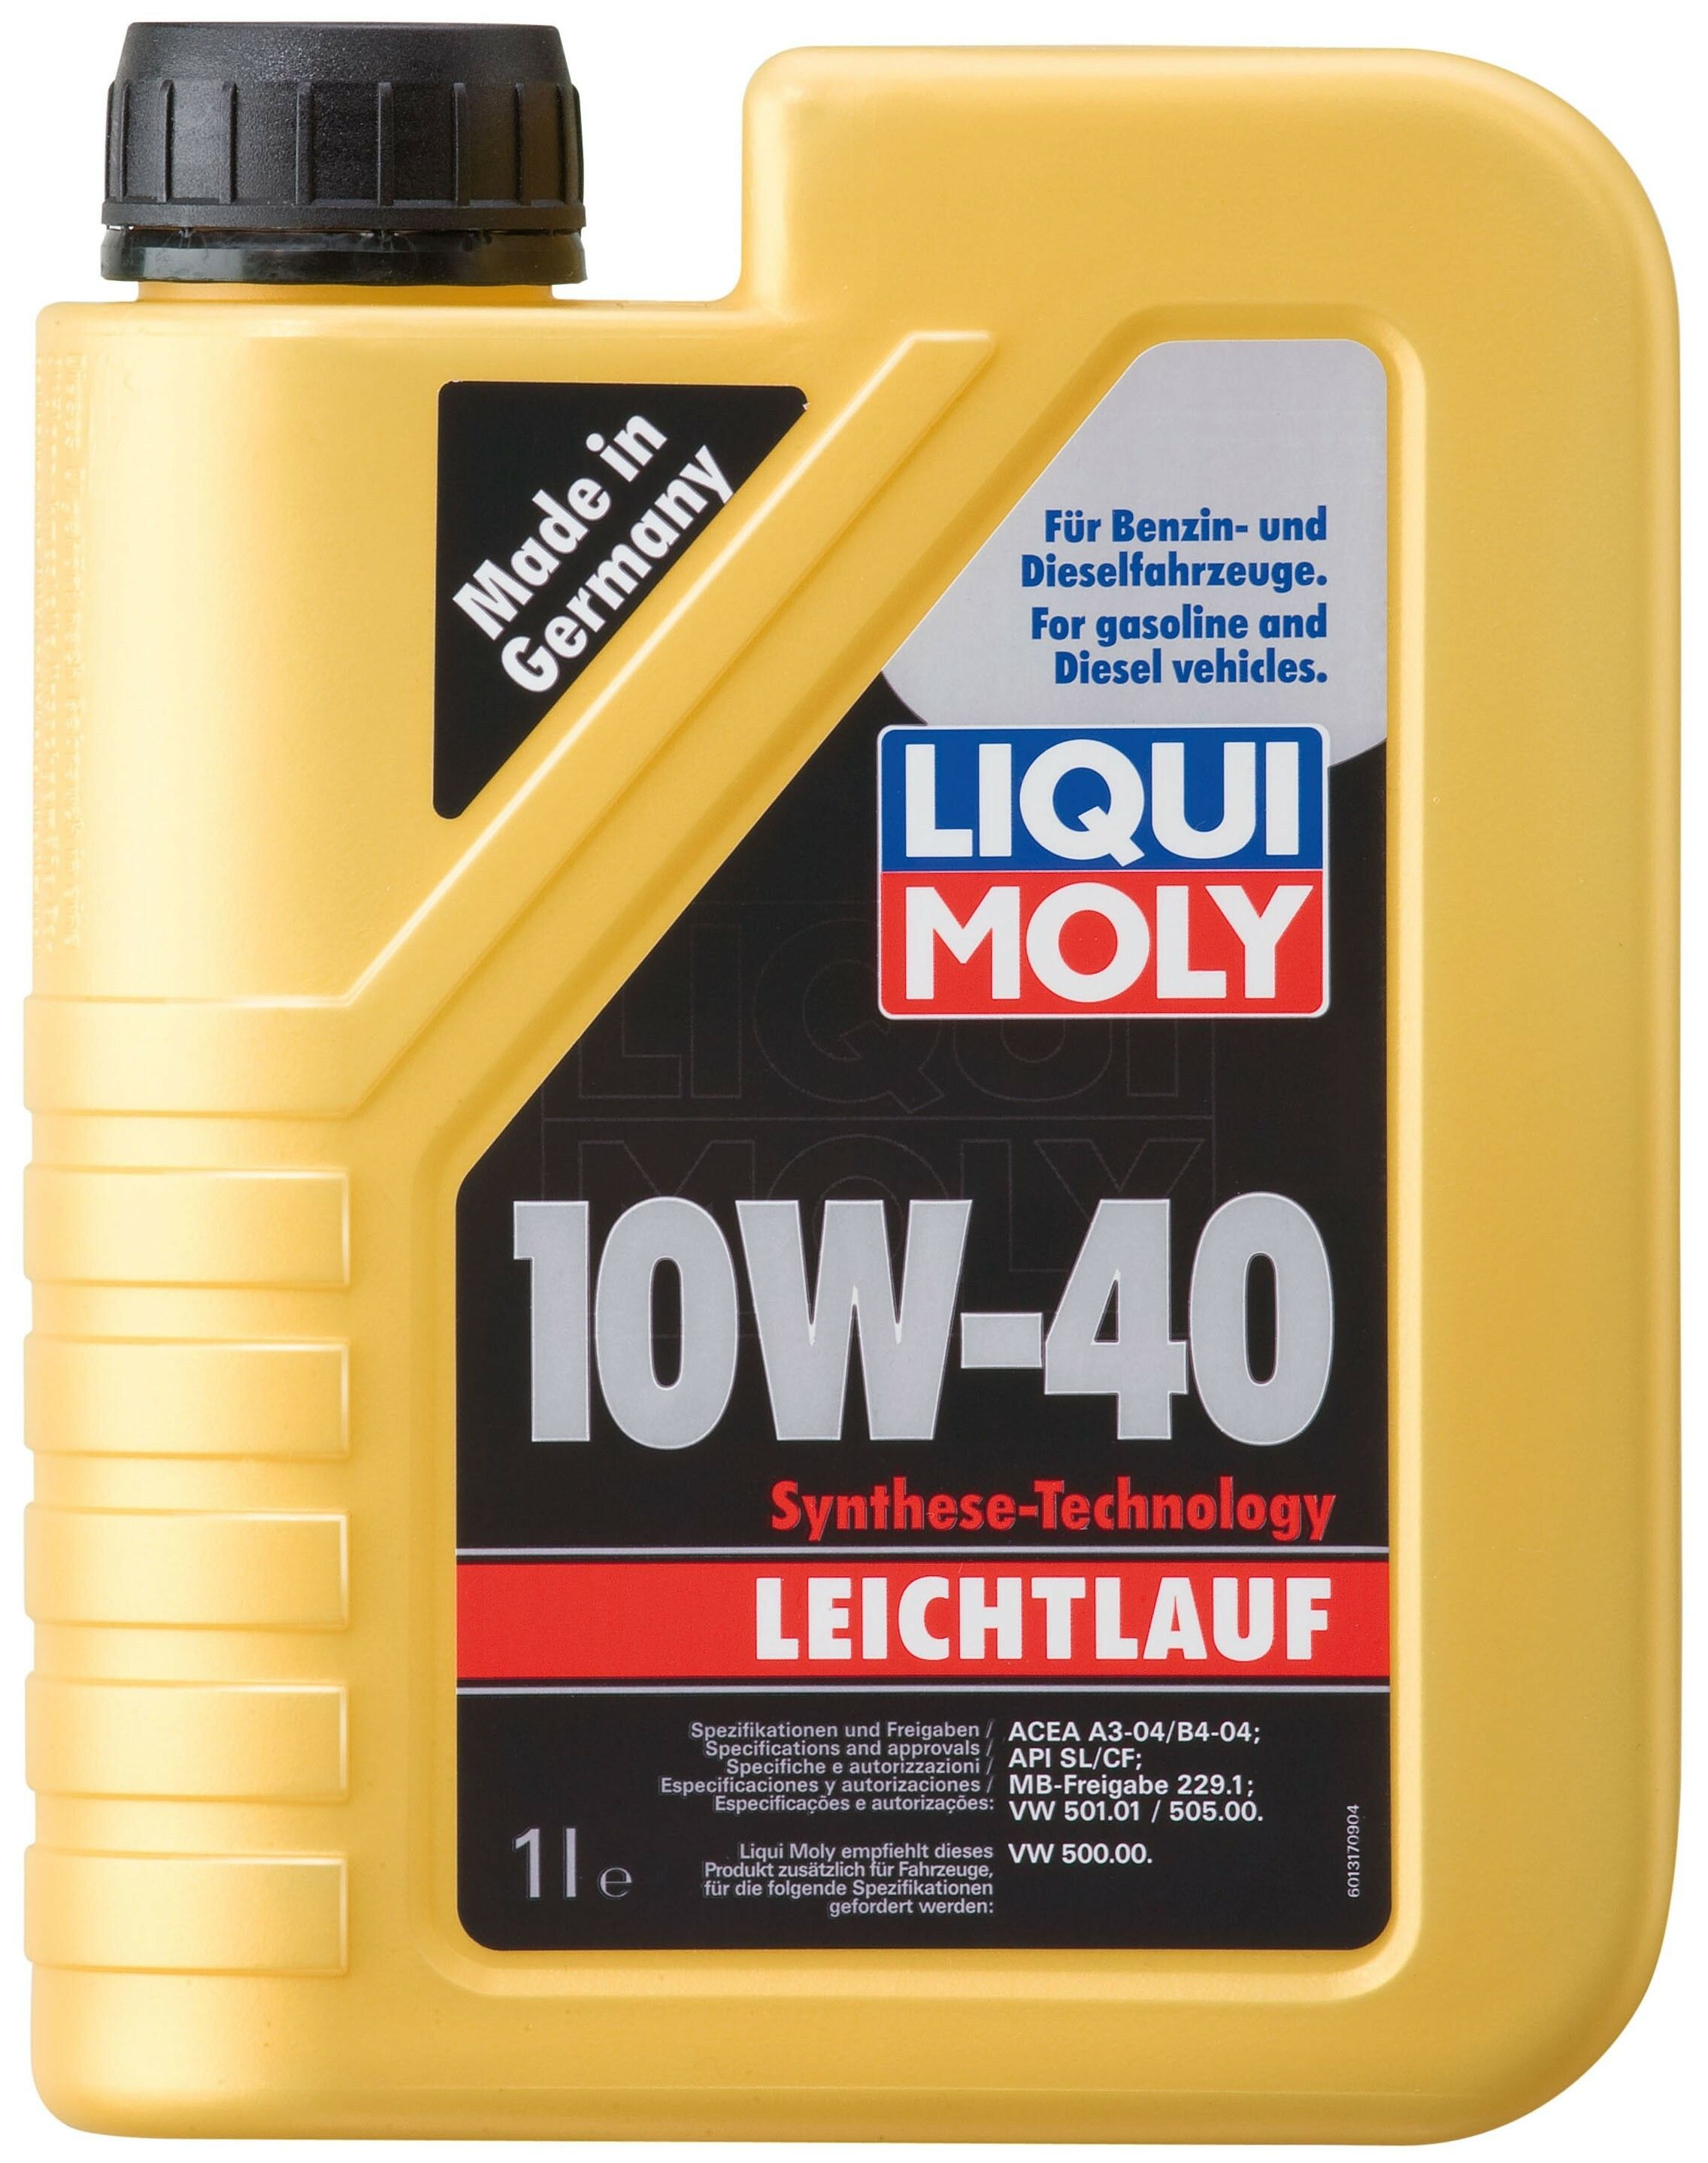 Motorový olej Liqui Moly Leichtlauf 10W40 1L LIQUI-MOLY